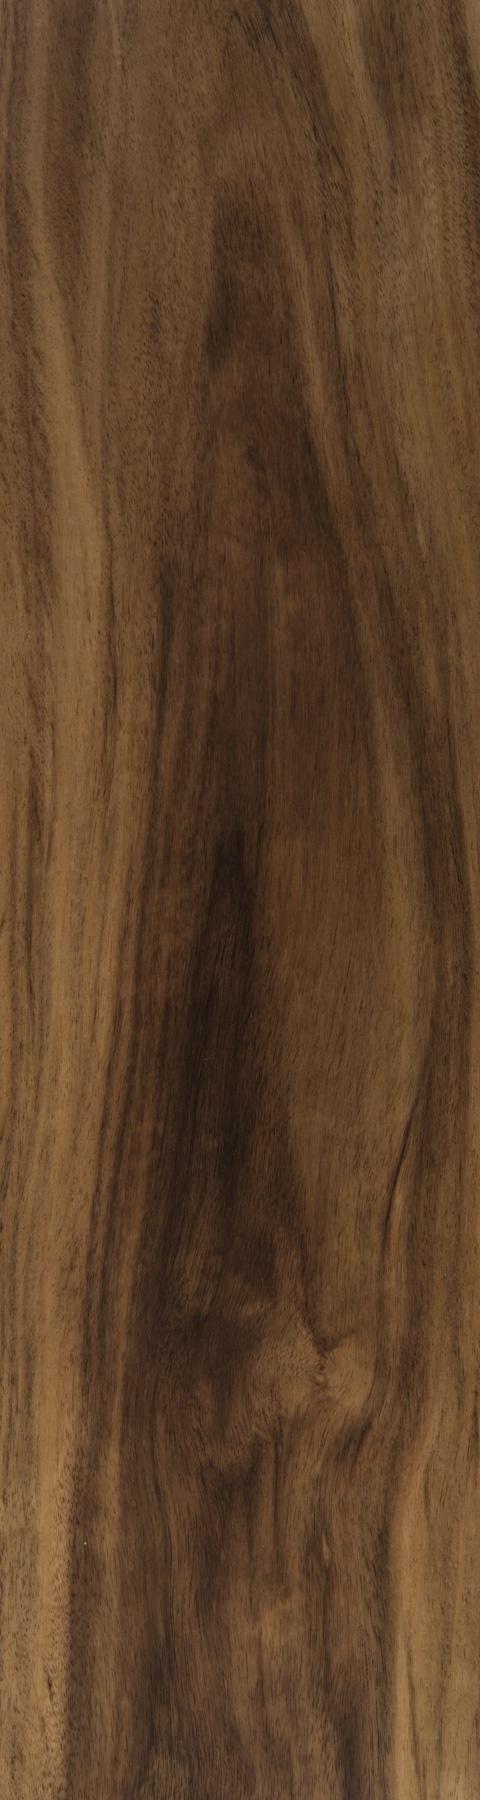 maderas-terramont-vitare-acacia